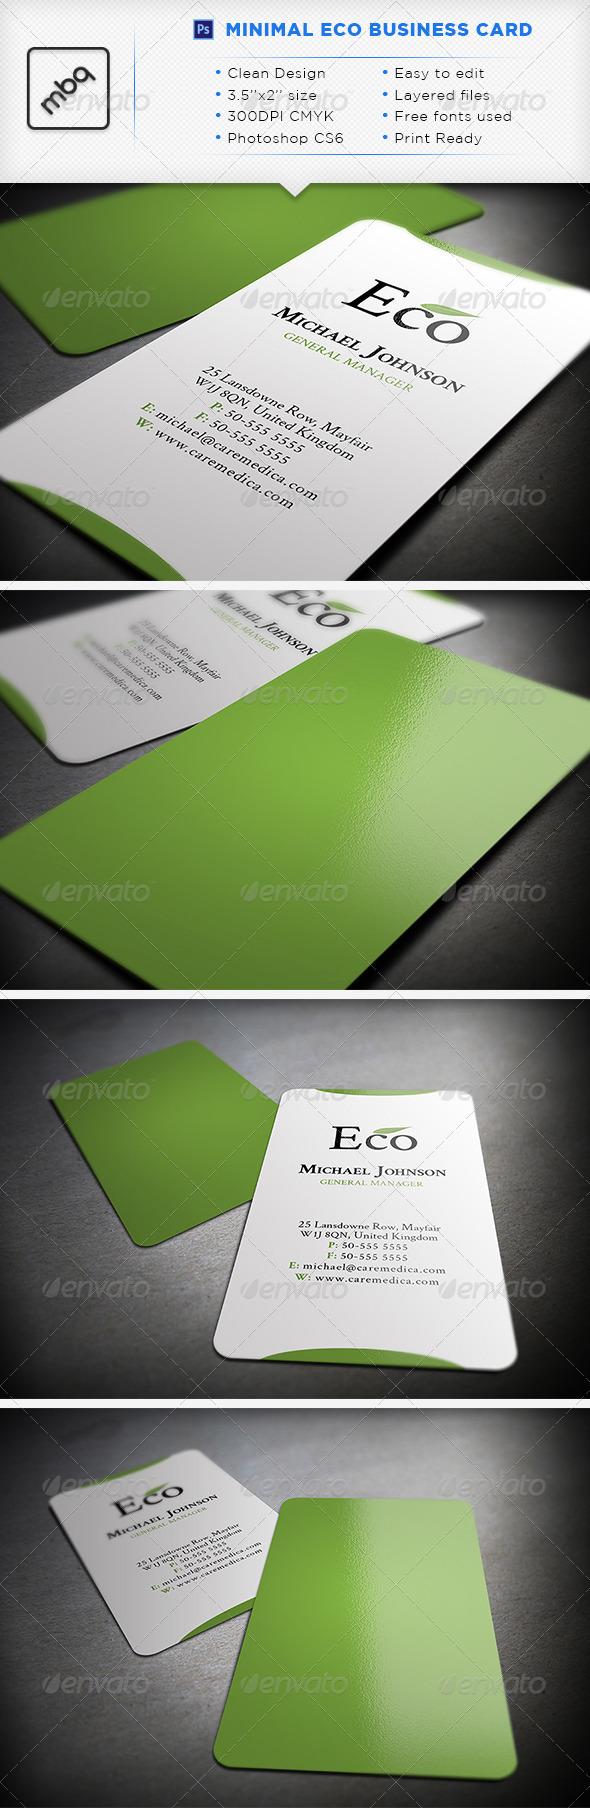 GraphicRiver Minimal Eco Business Card 3595740